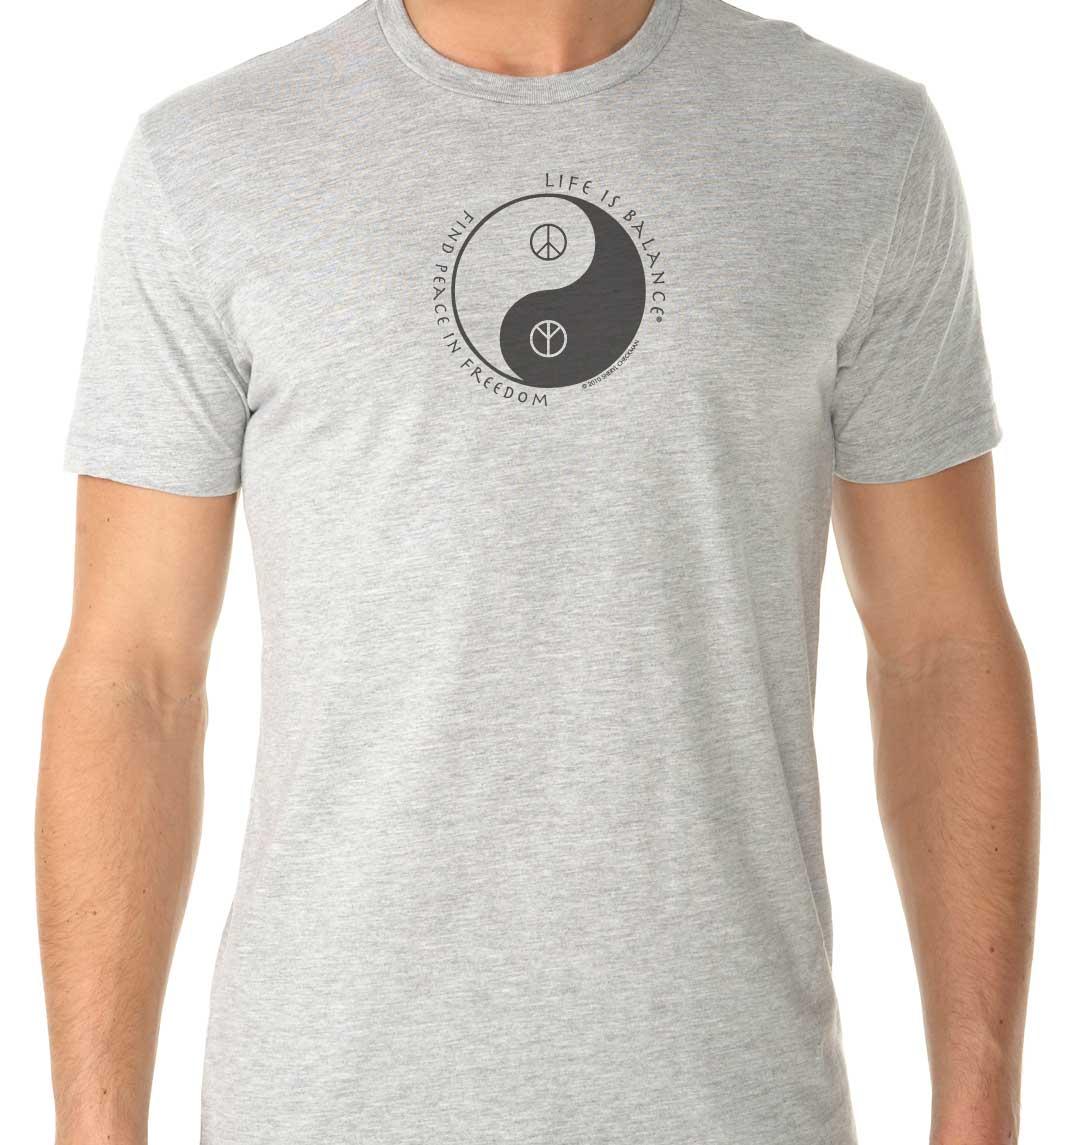 Inspirational peace symbol t-shirt for men (gray/black)